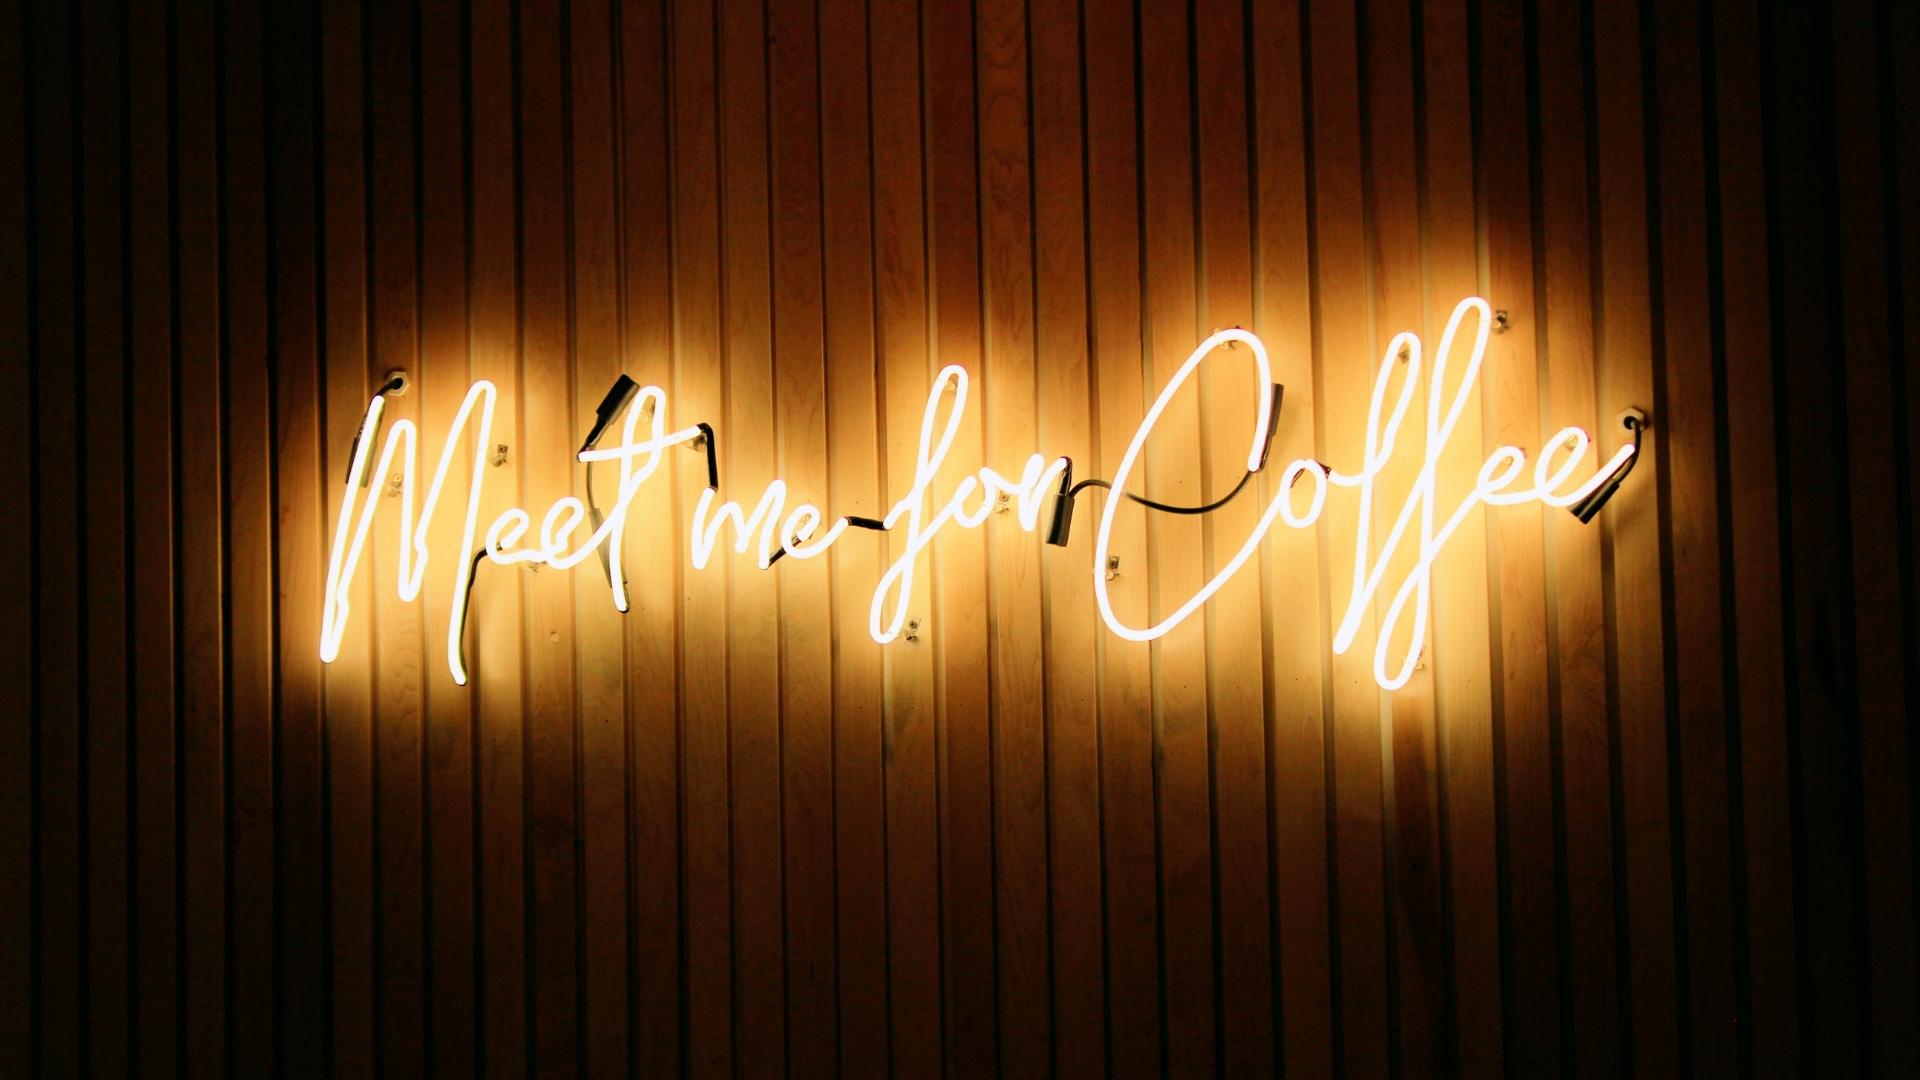 banner-lines-to-love-tea-or-coffee-09.jpg